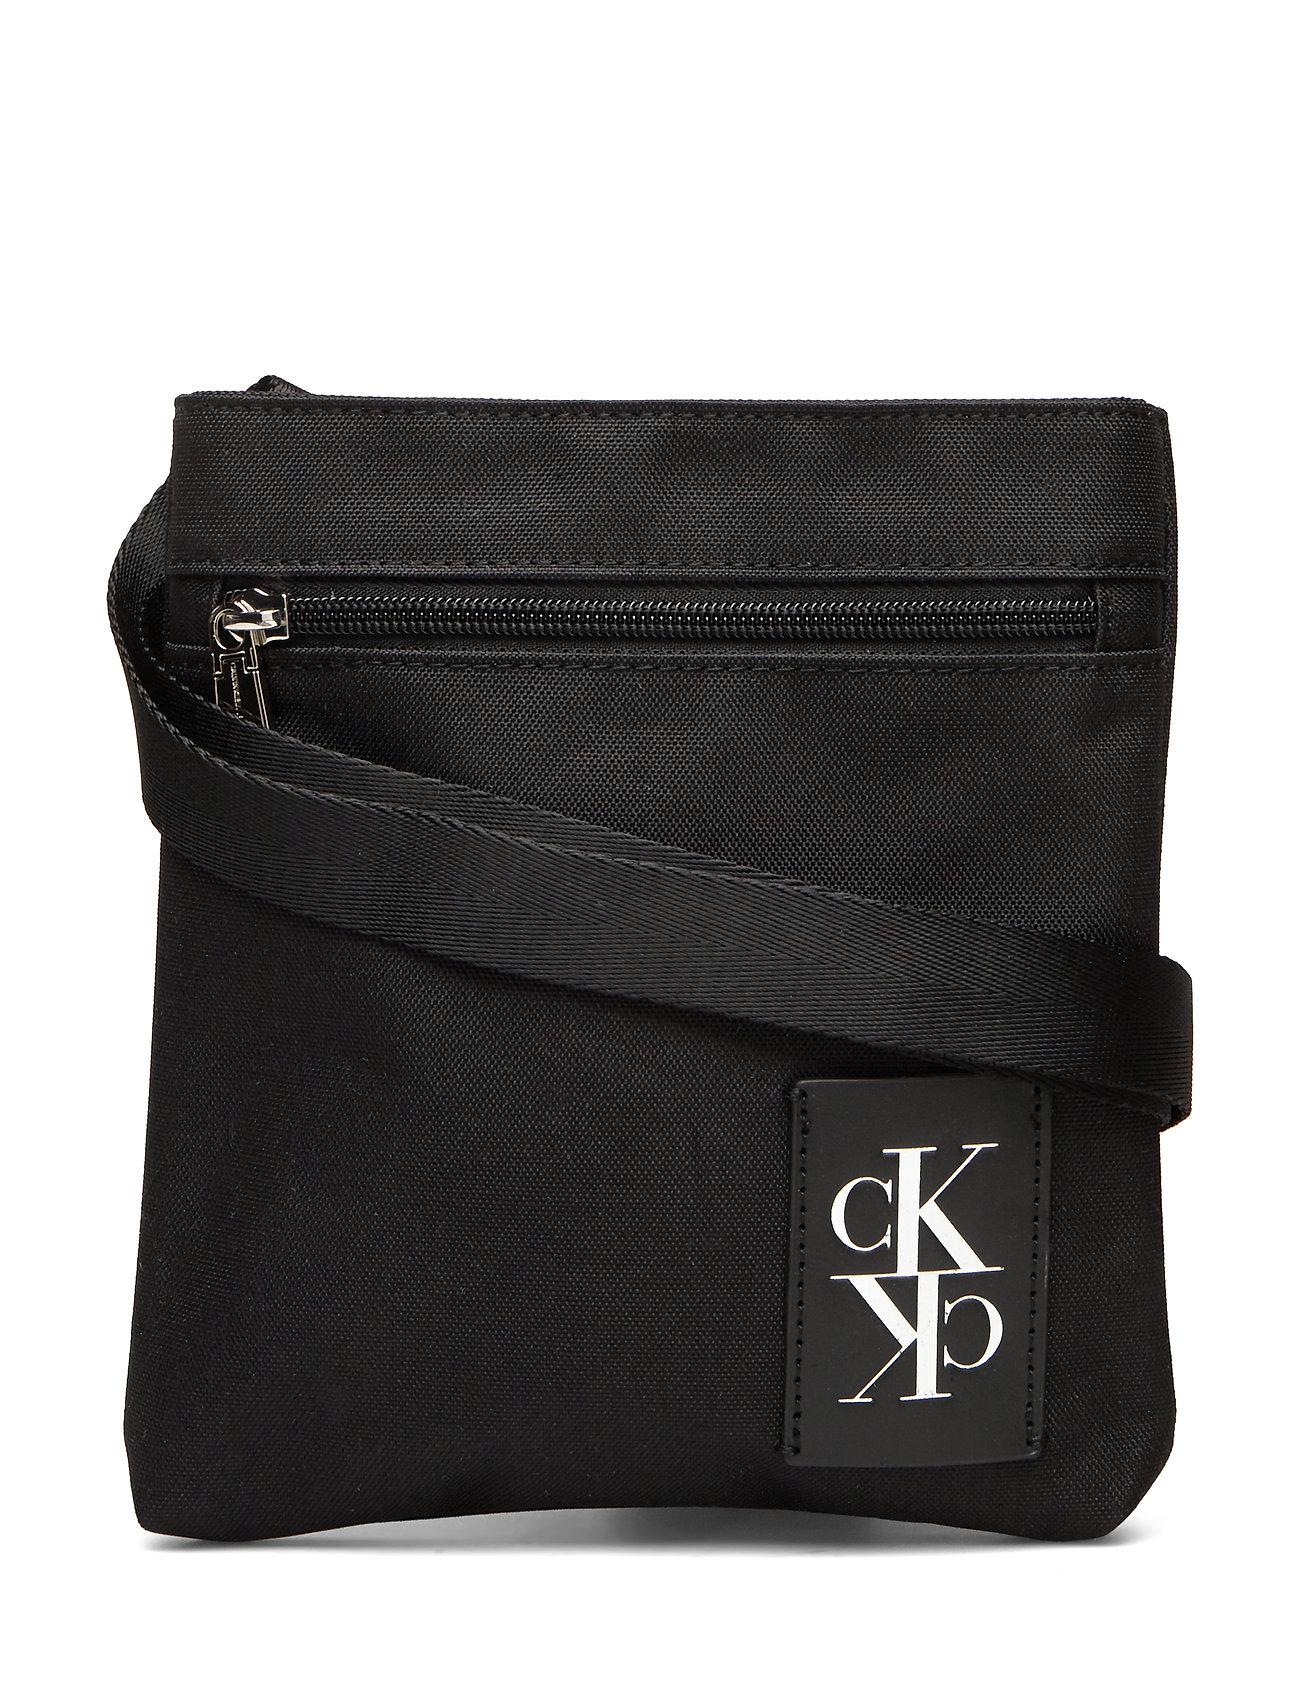 Calvin Klein SPORT ESSENTIALS MICRO FLAT PACK - BLACK